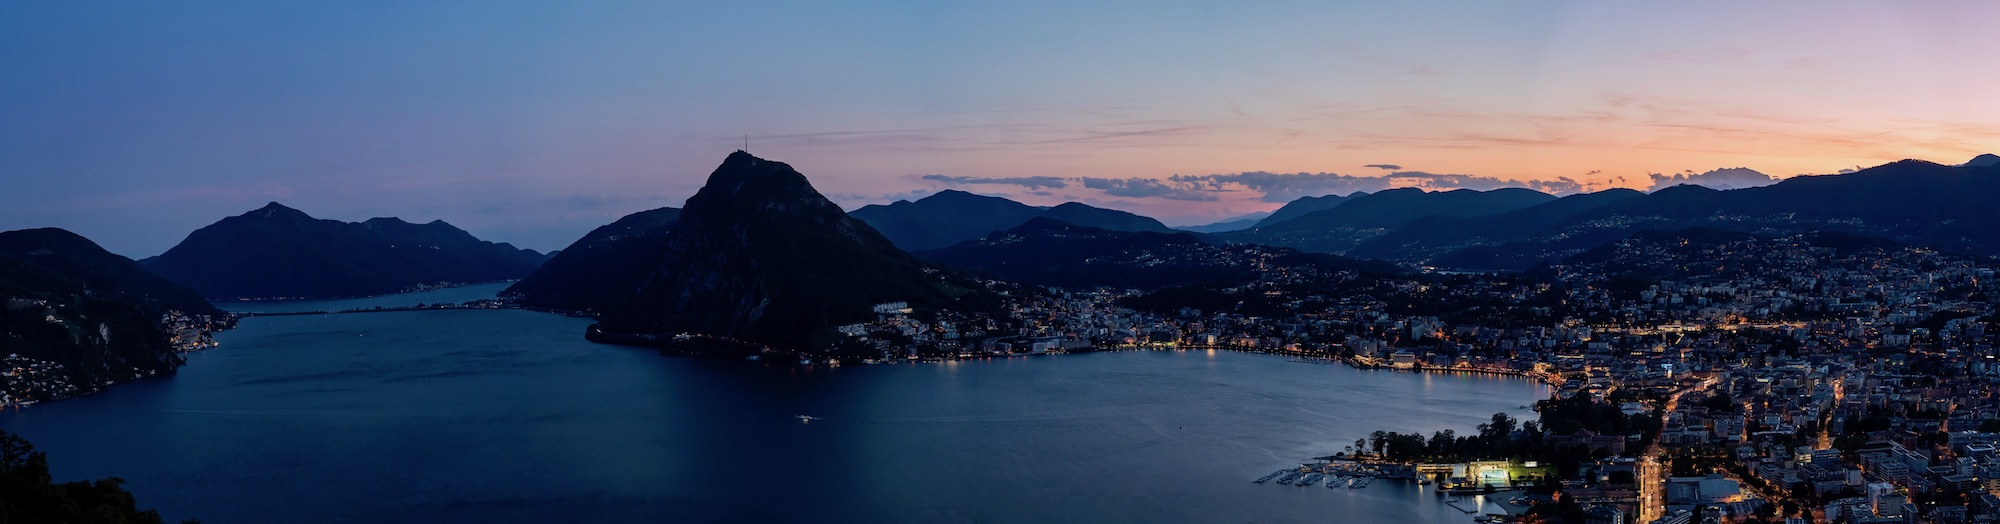 Mega Panorama Lugano